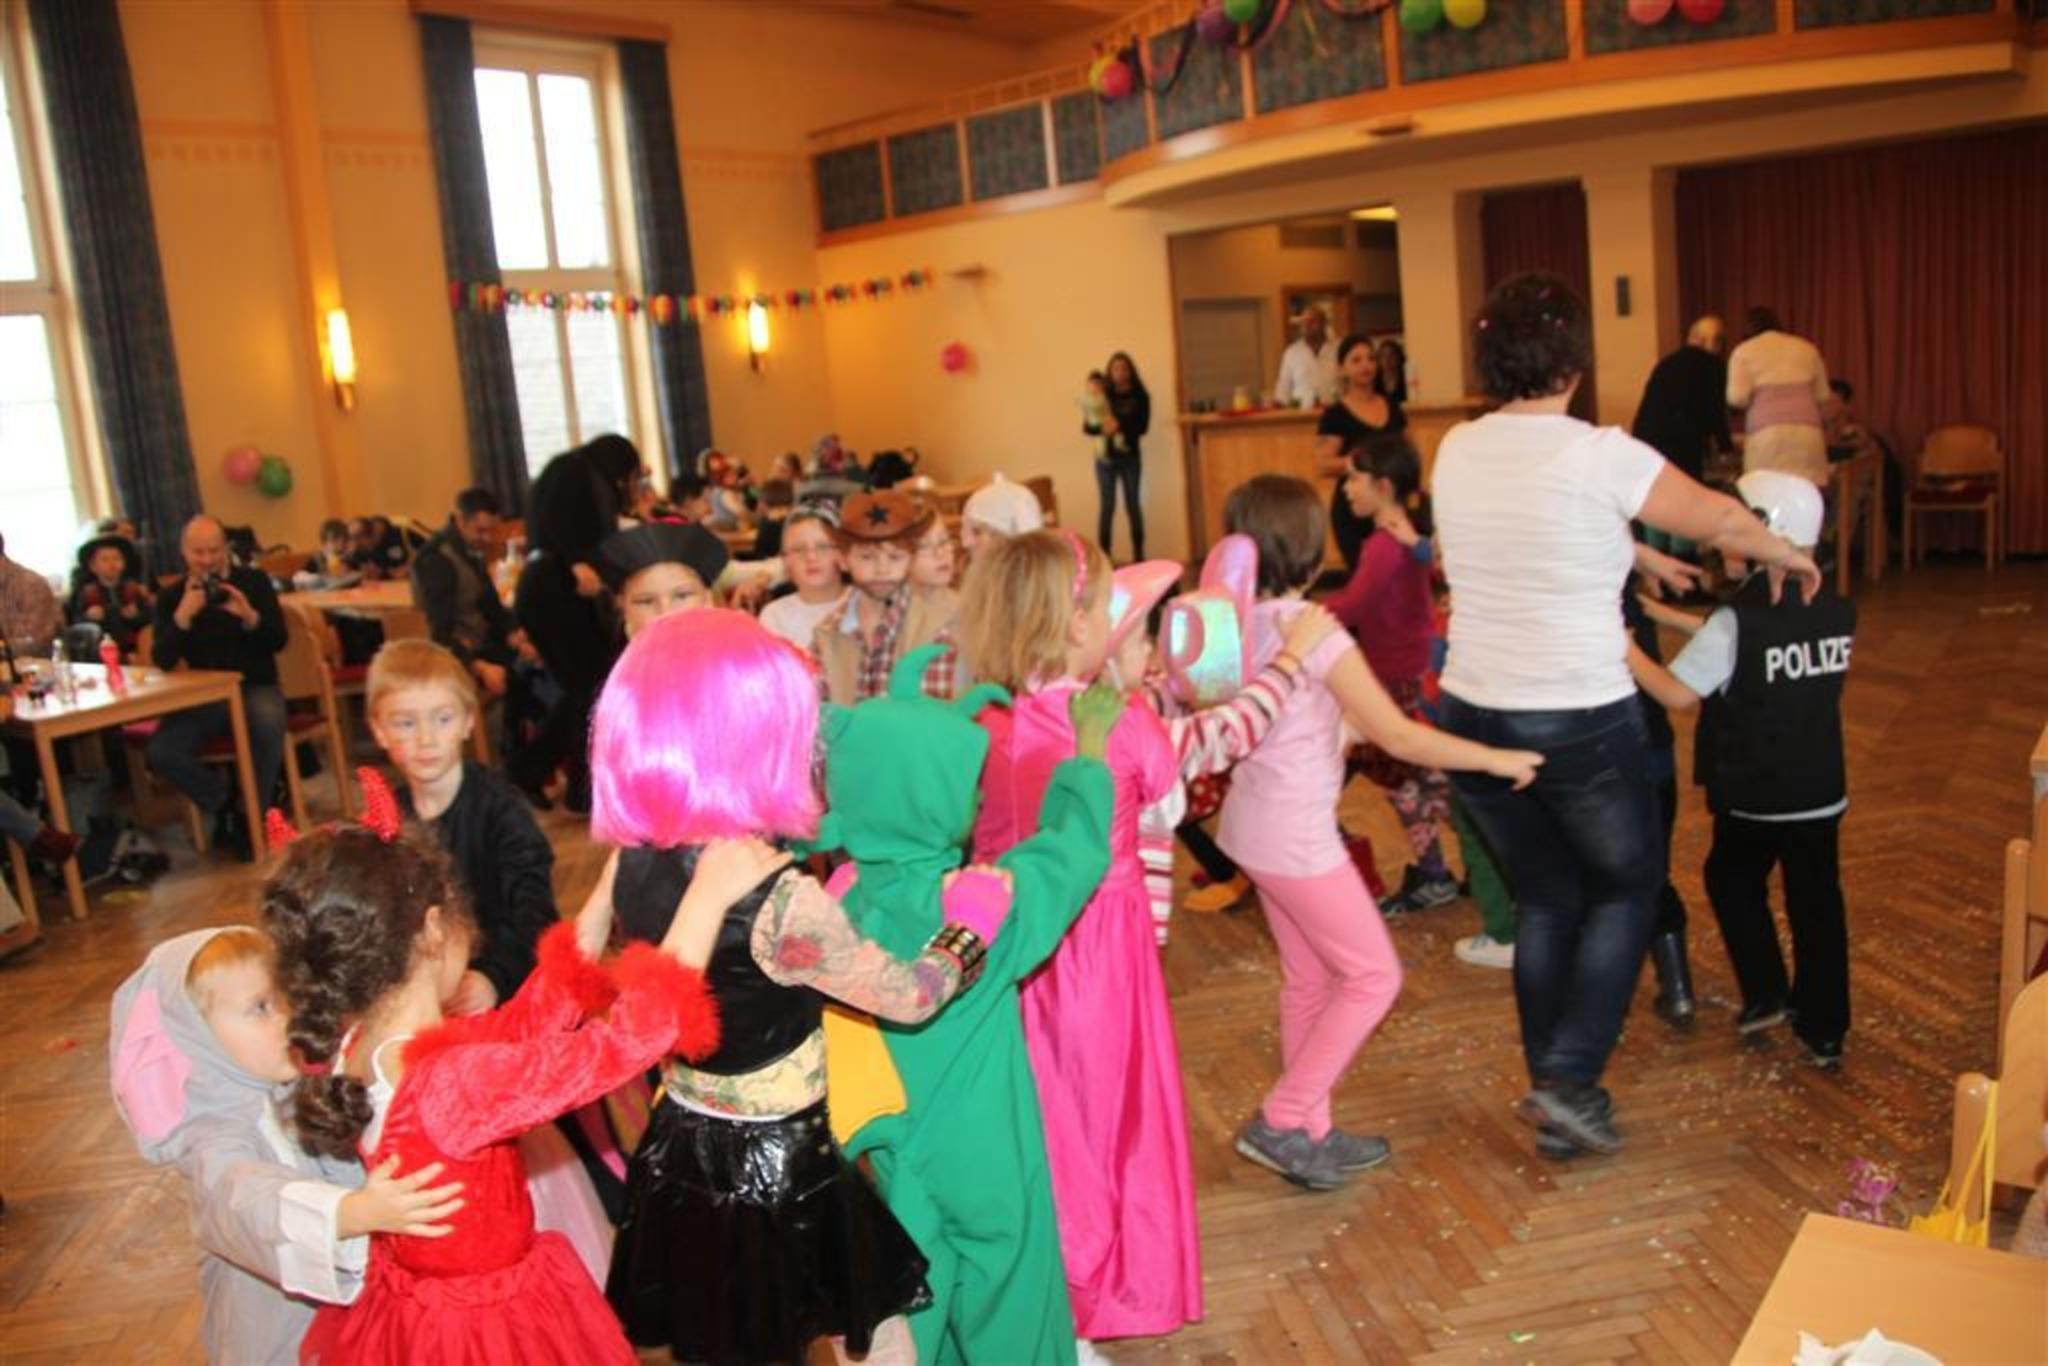 Festsaal Bheimkirchen - volunteeralert.com